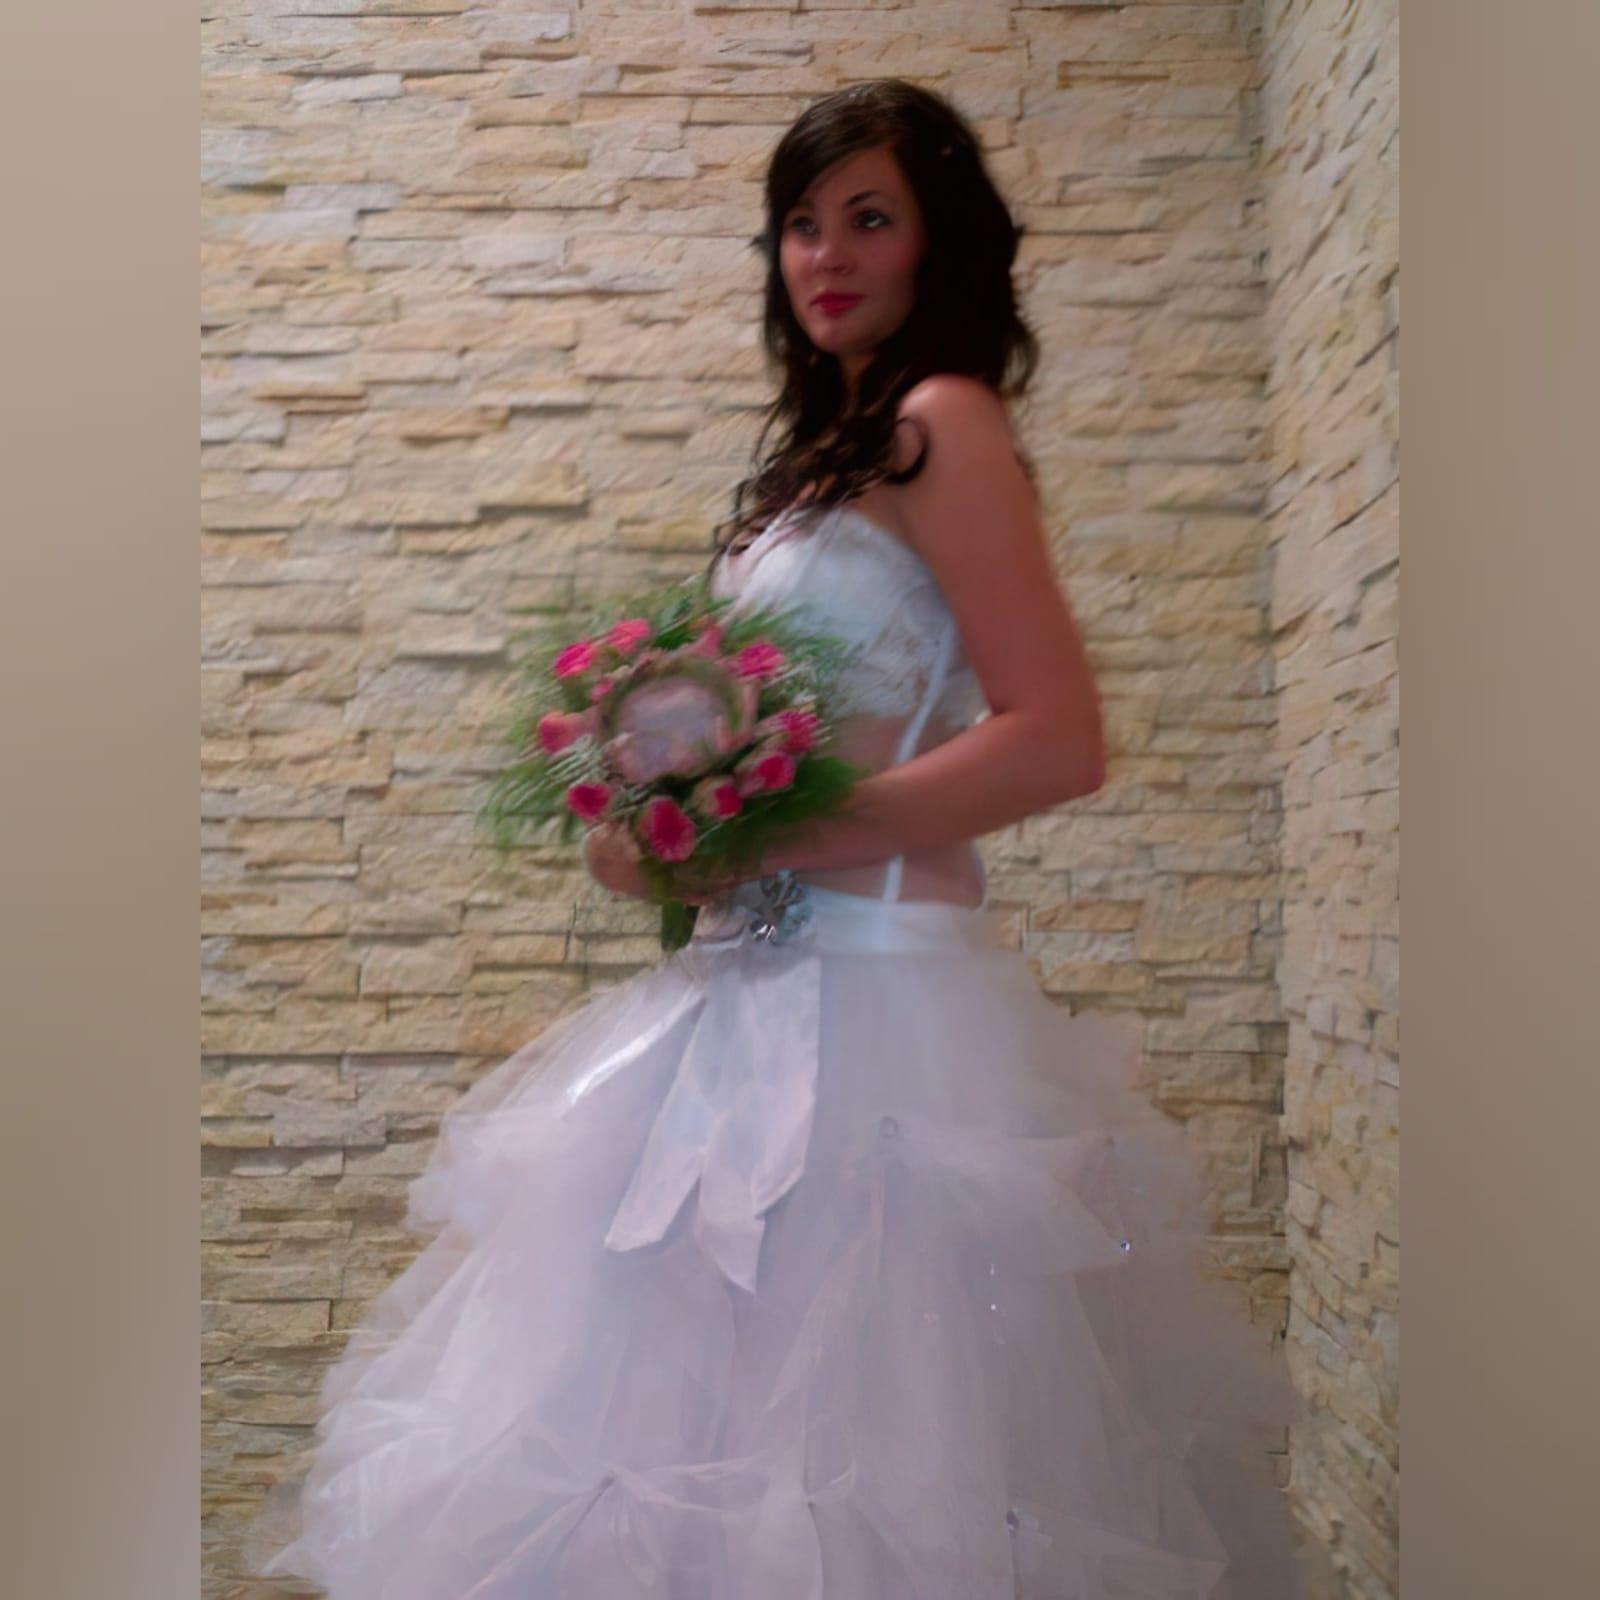 White wedding brides ball gown dress 2